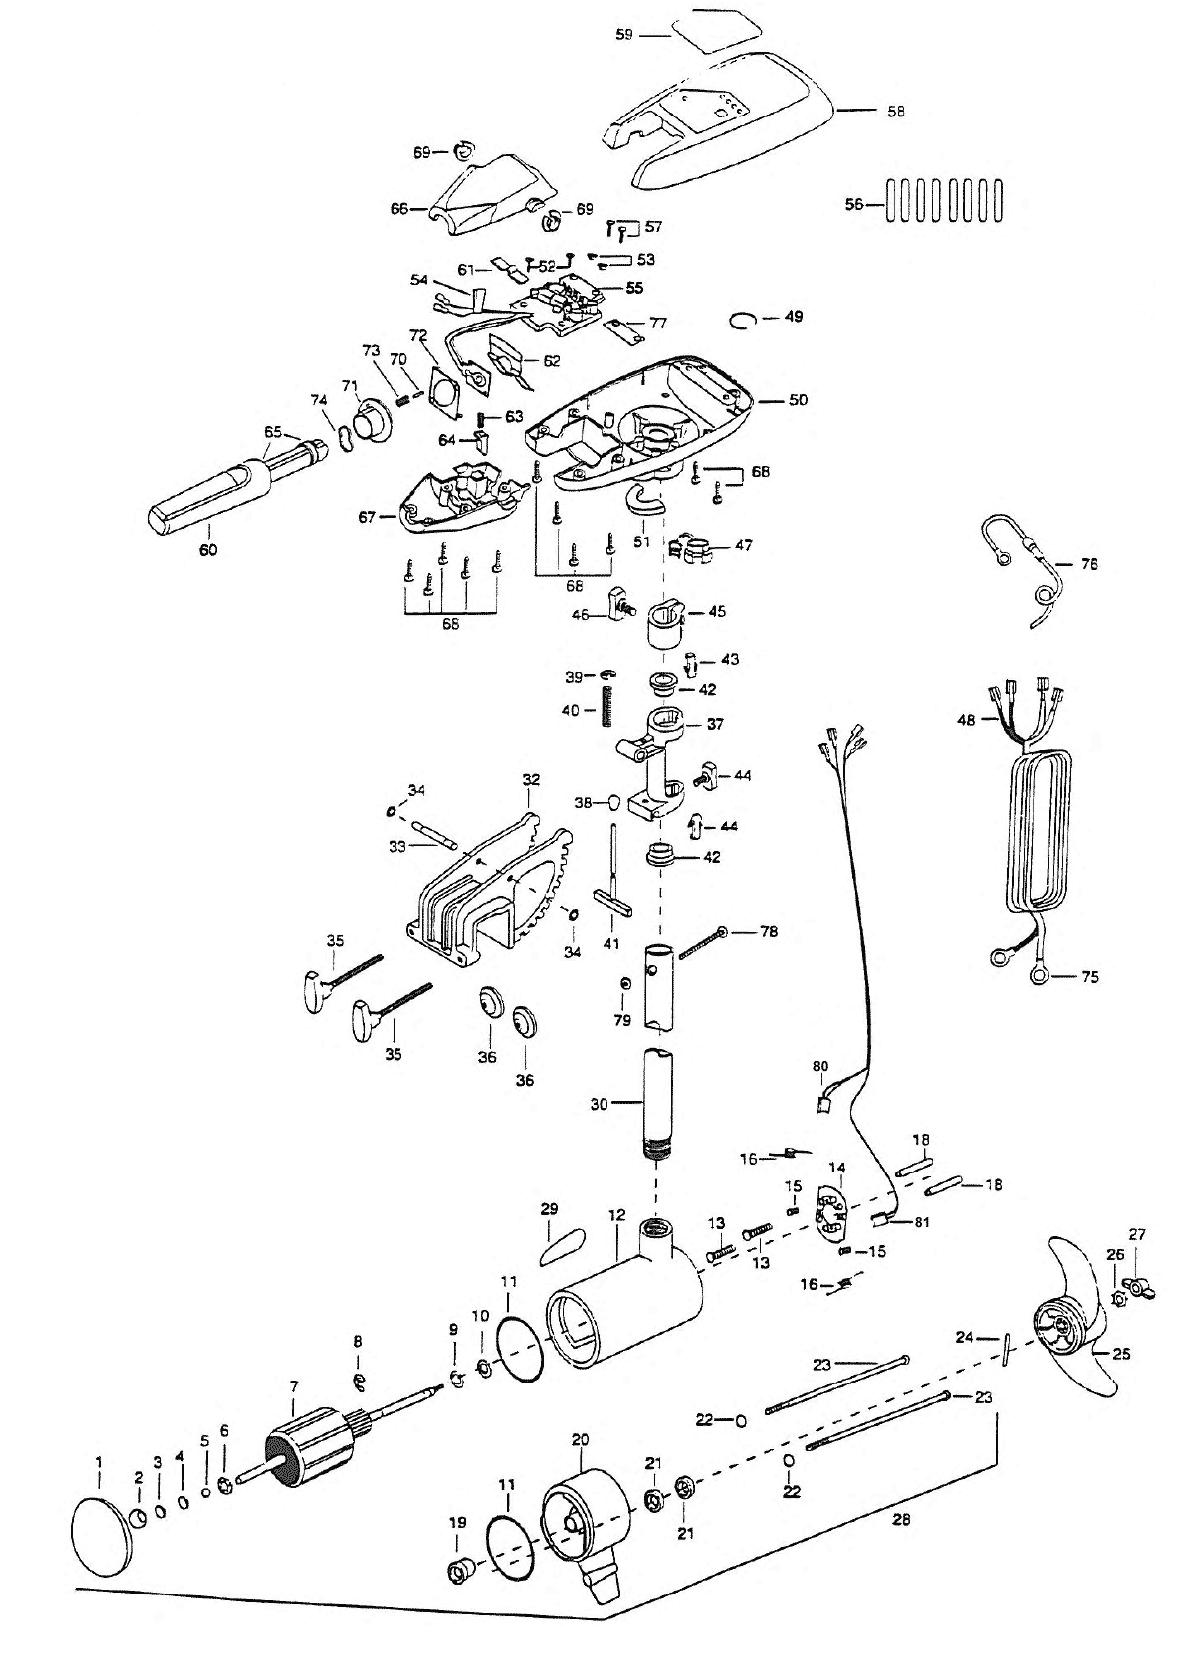 minn kota riptide 55s  42 inch  parts